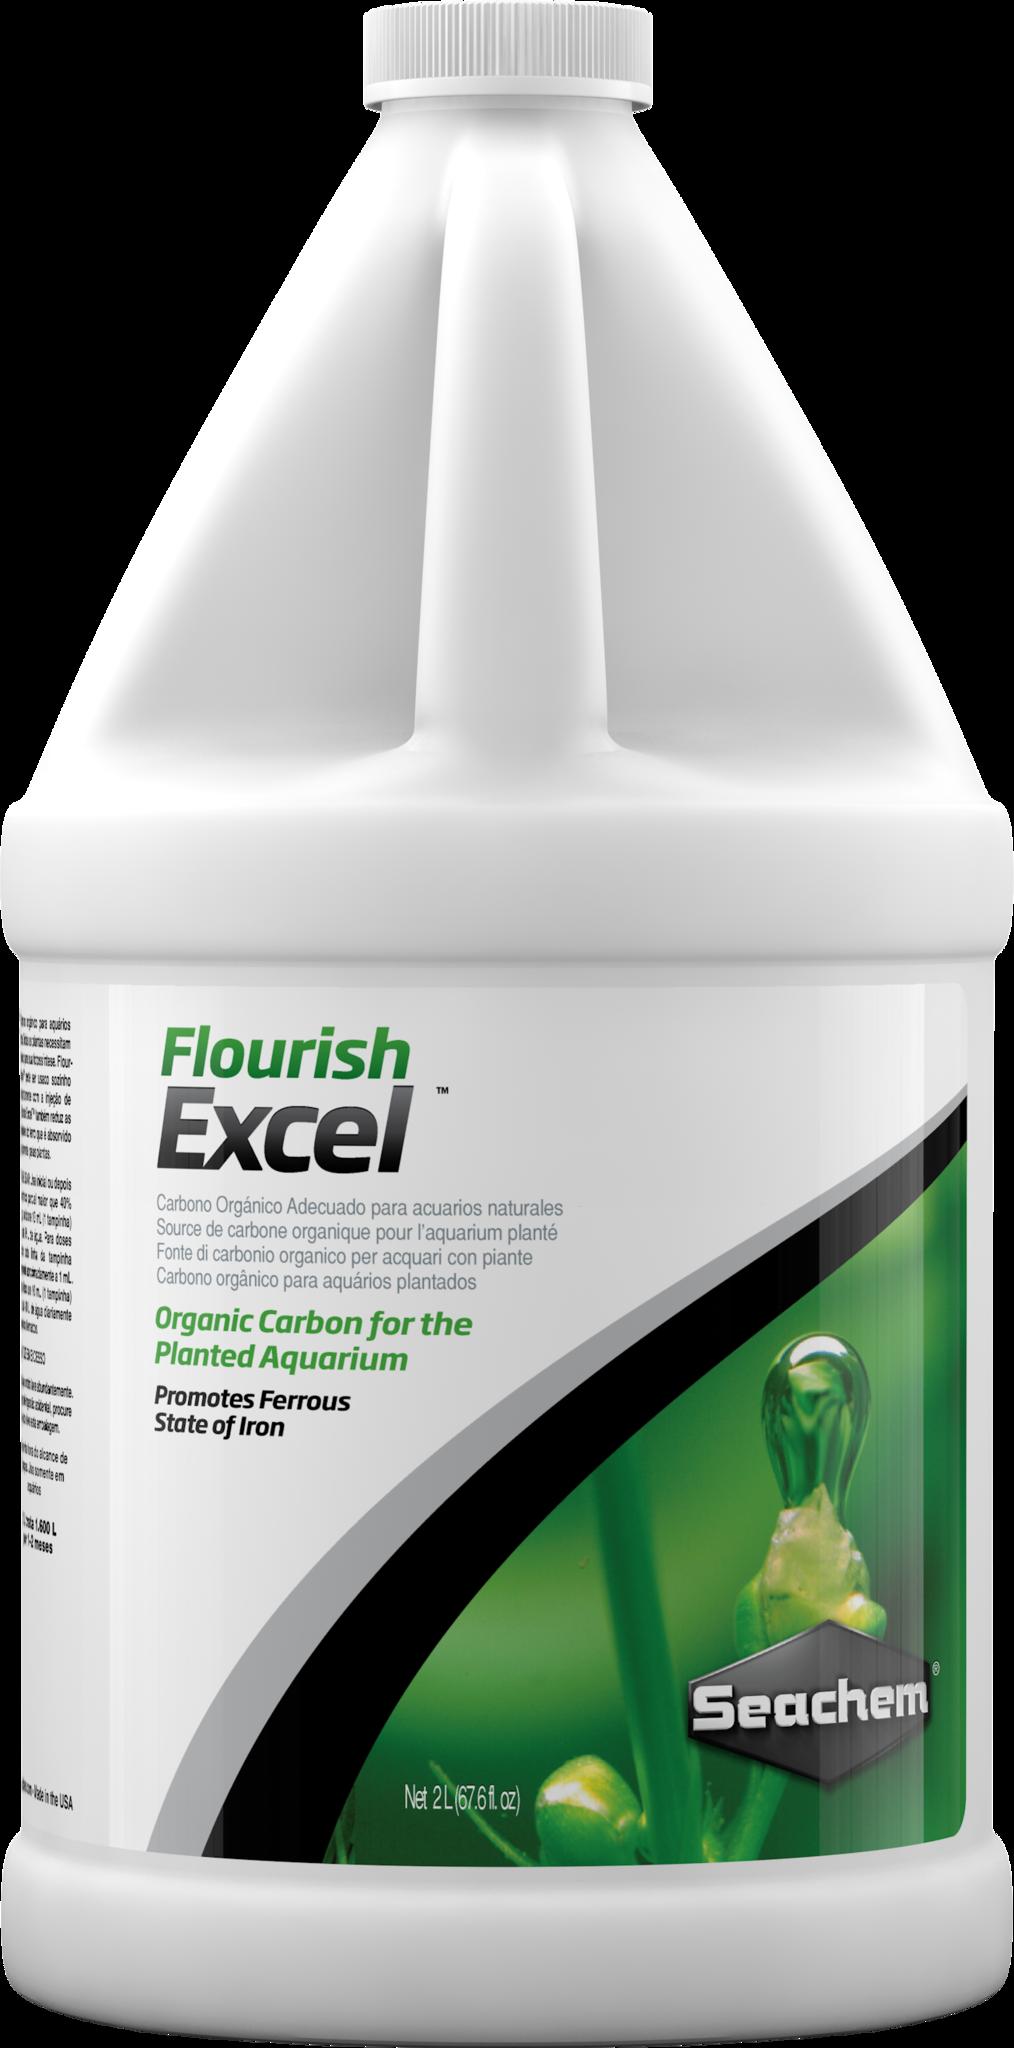 Seachem Flourish excel 2 liter